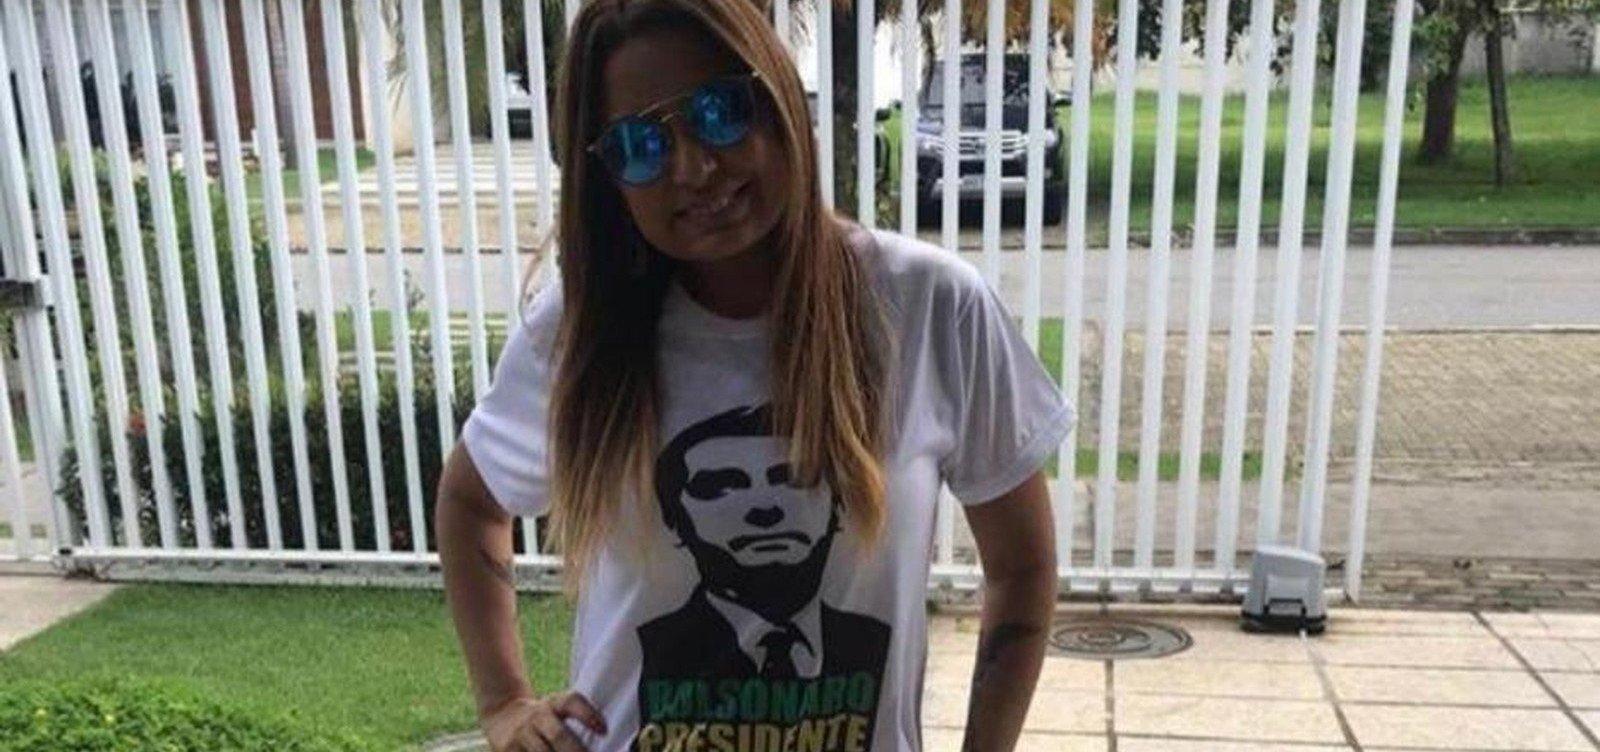 [Promotora que declarou apoio a Bolsonaro nas eleições se afasta do caso Marielle]